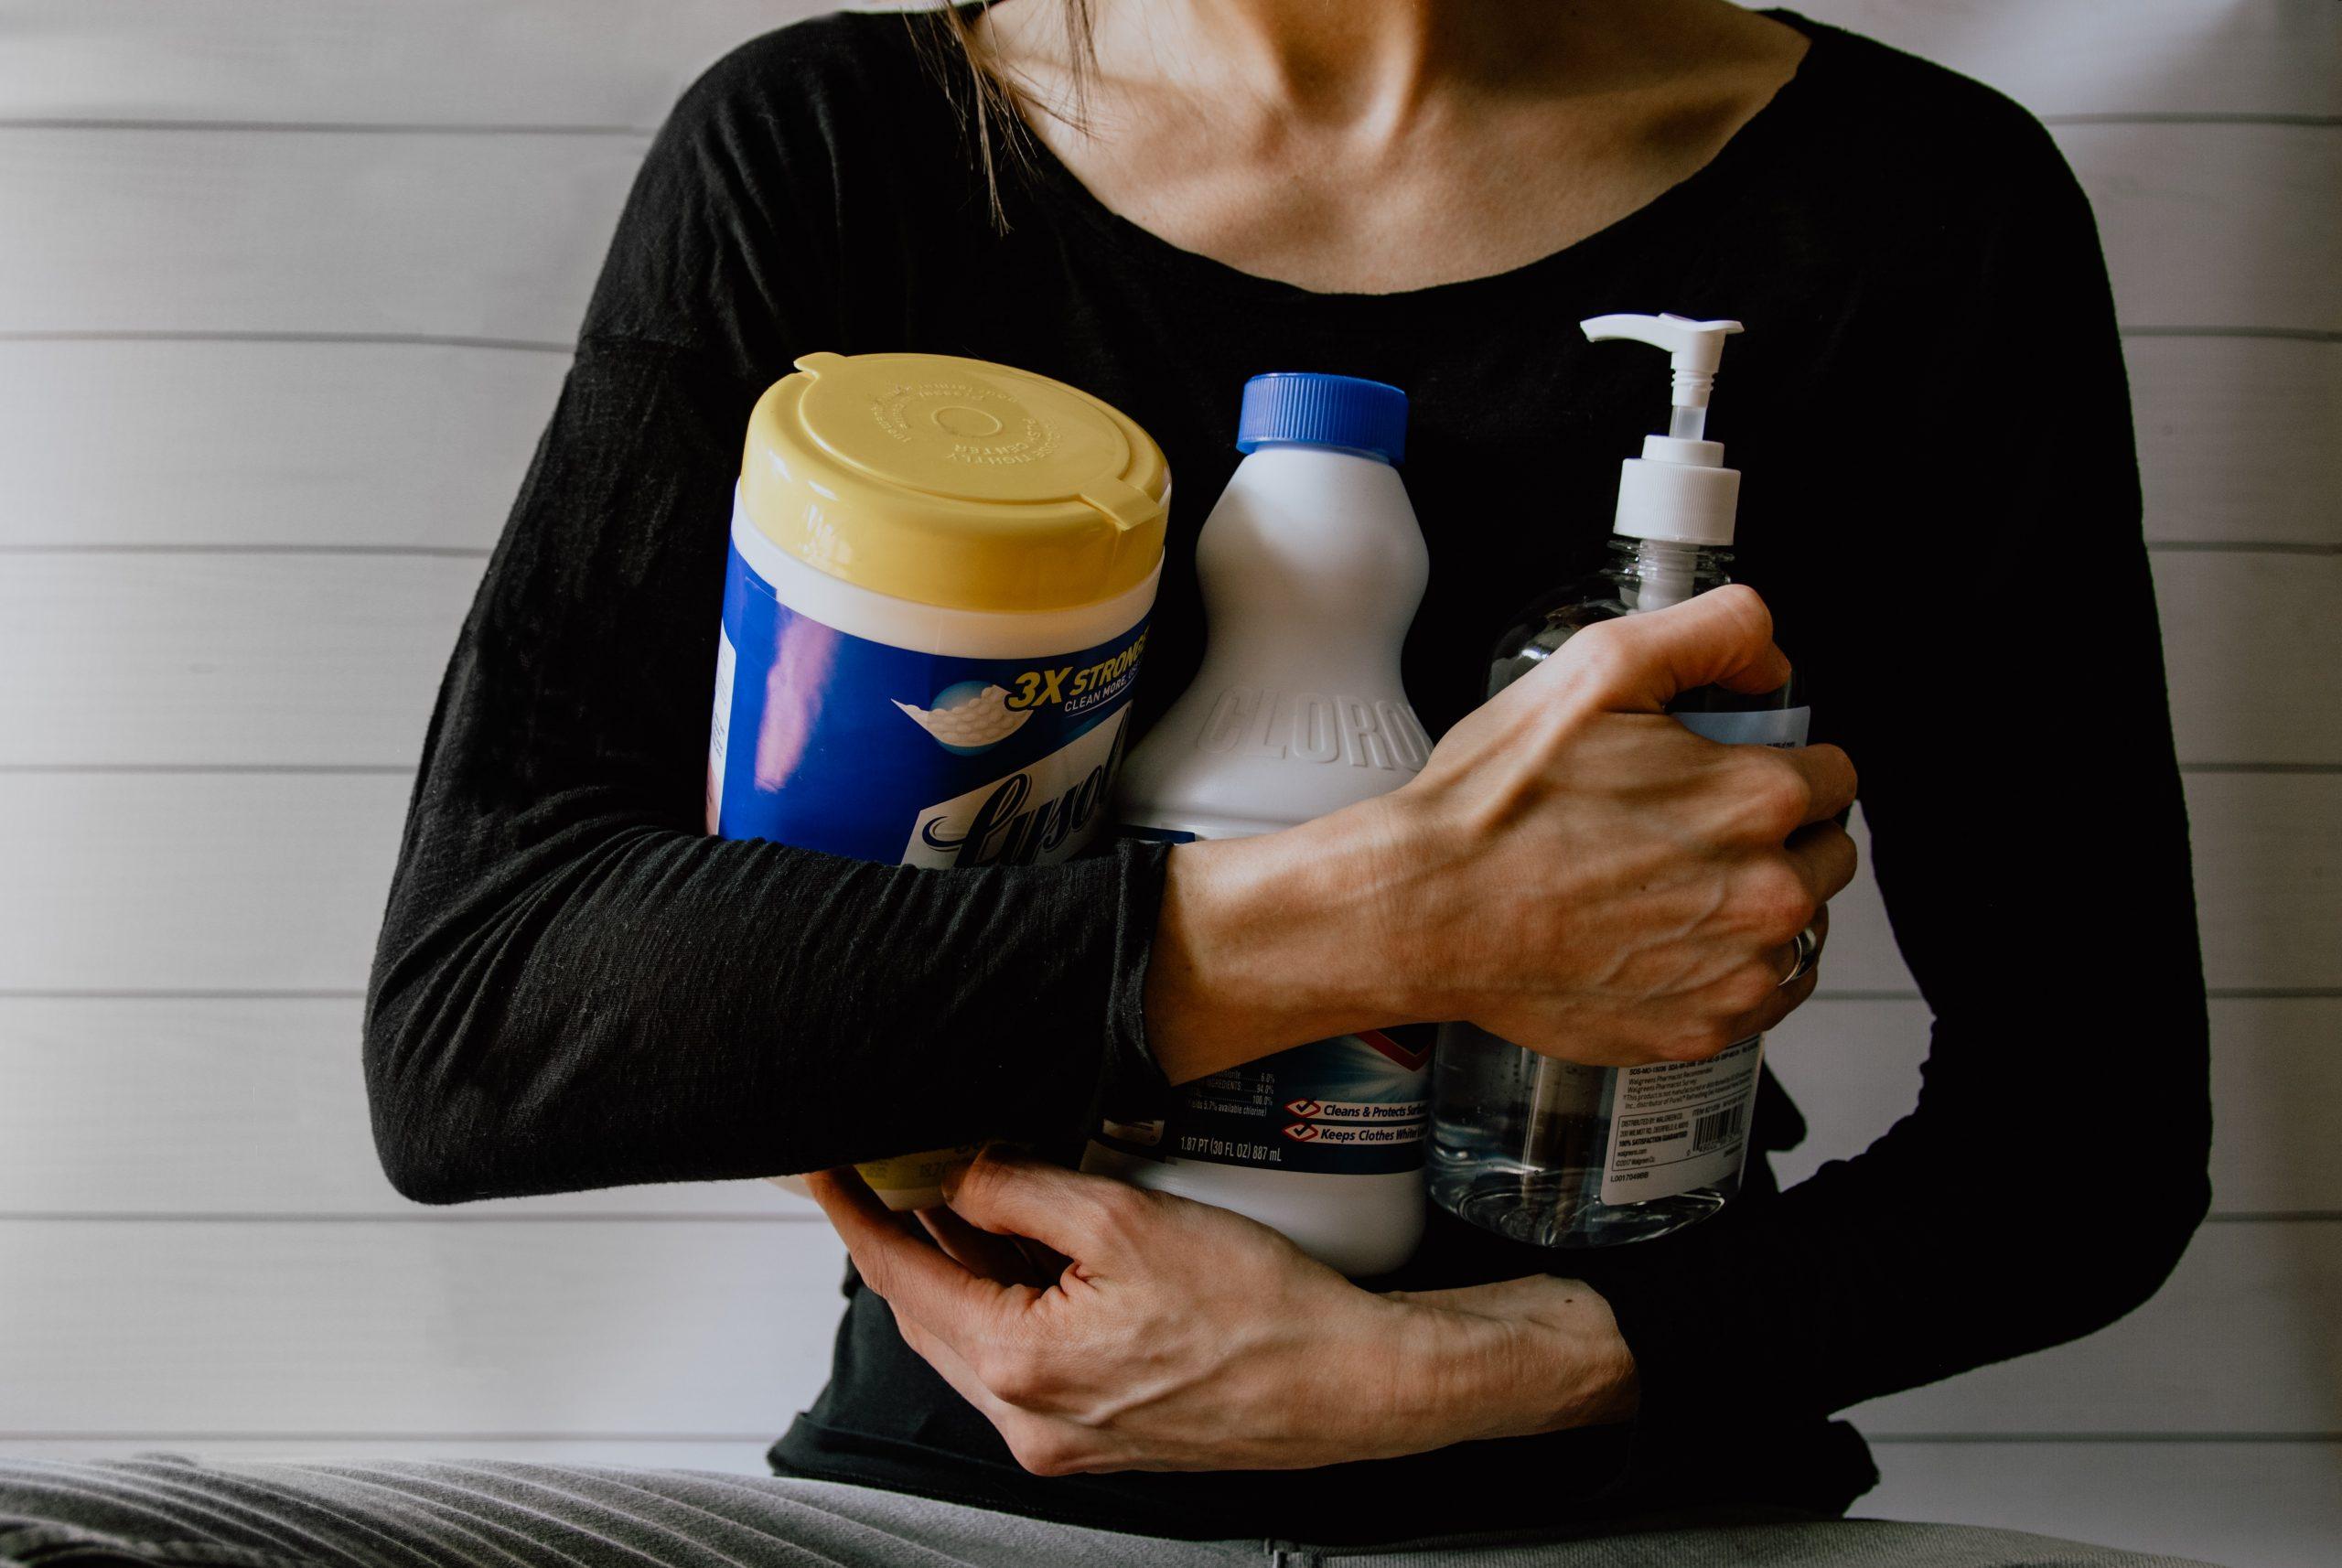 mulher segurando produtos de limpeza